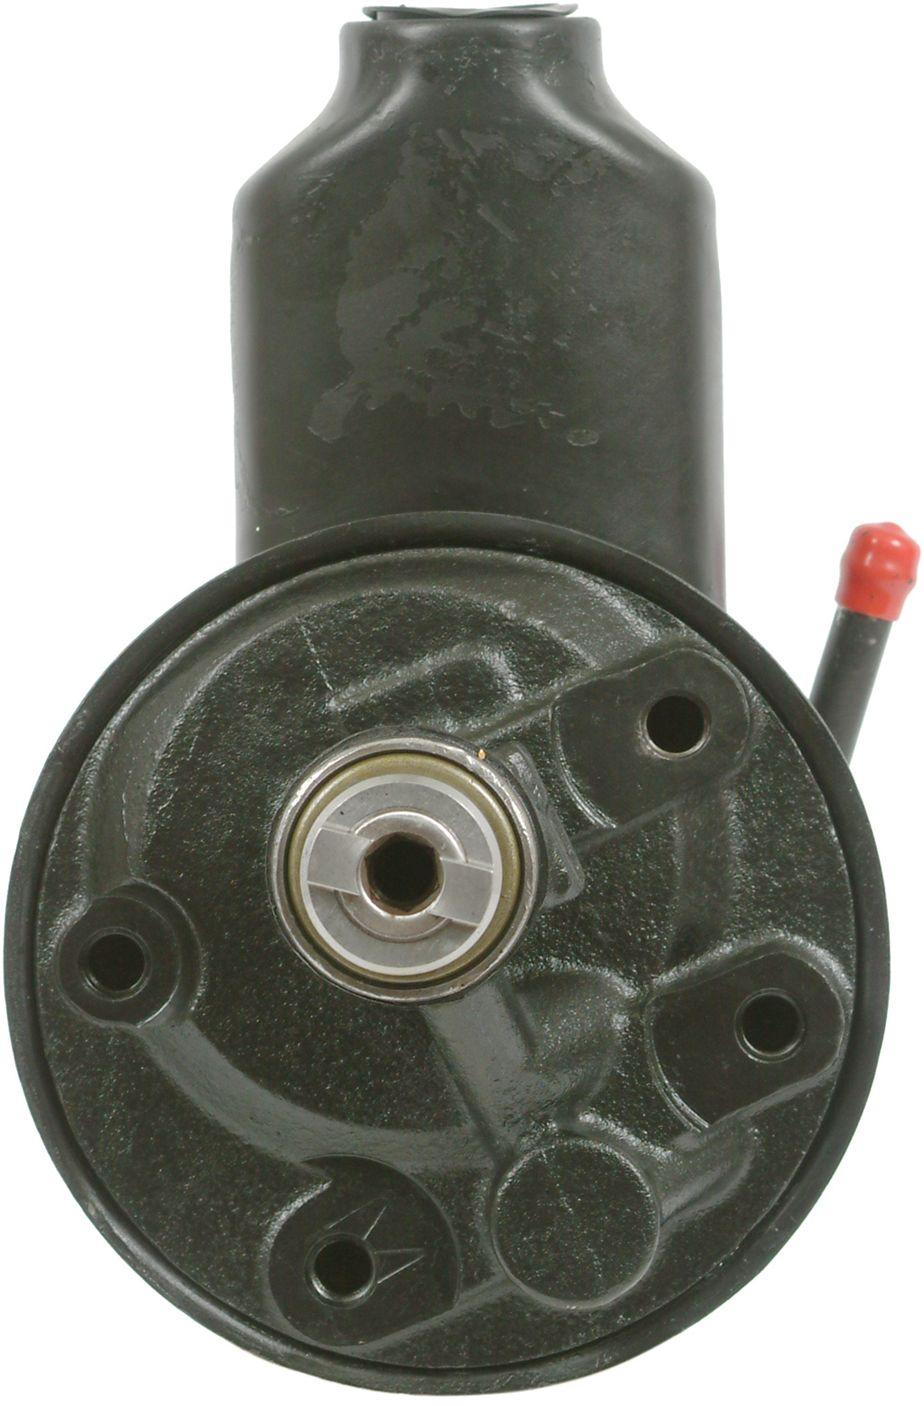 medium resolution of  1996 dodge ram 2500 power steering pump a1 20 8001